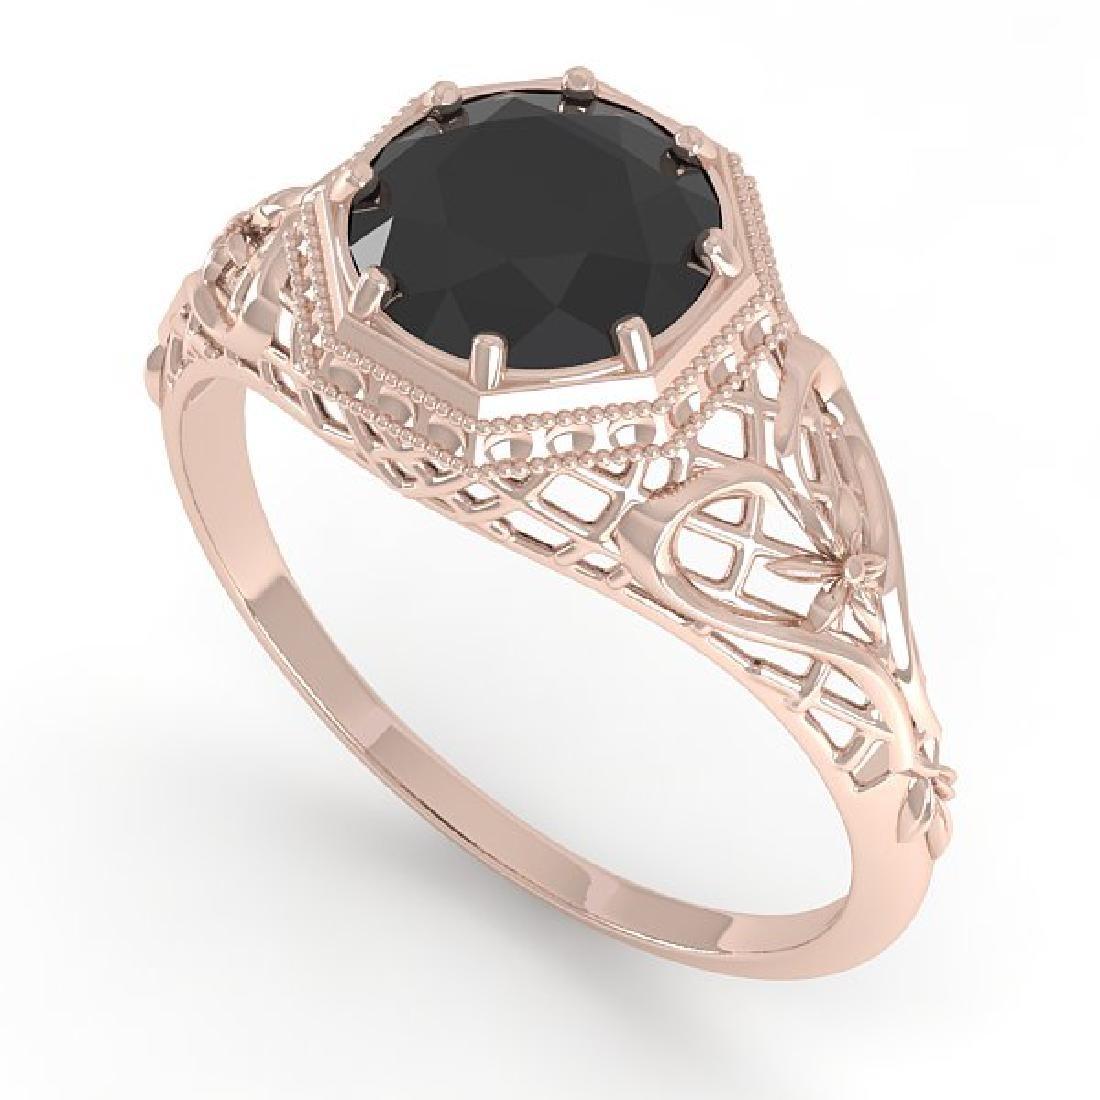 1.50 CTW Black Certified Diamond Ring Art Deco 14K Rose - 2